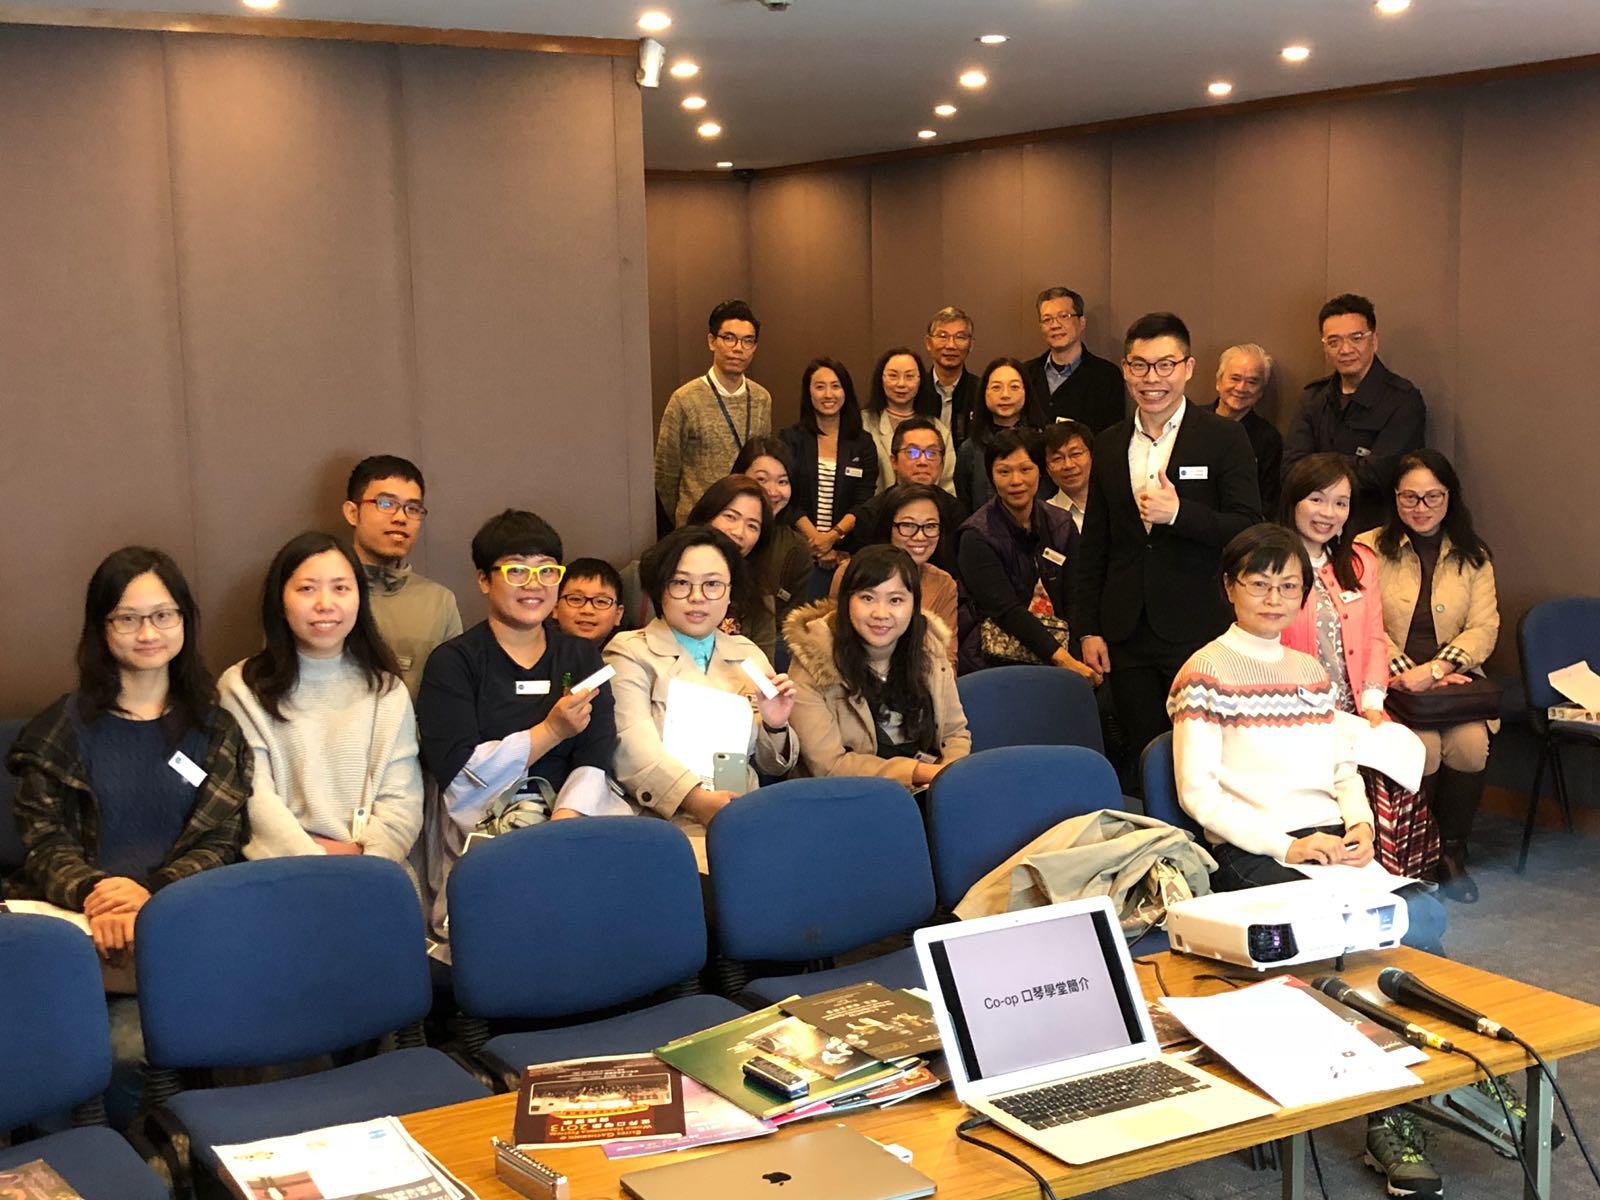 Group Photo - 25 Feb 2018 Train the Trainer Workshop